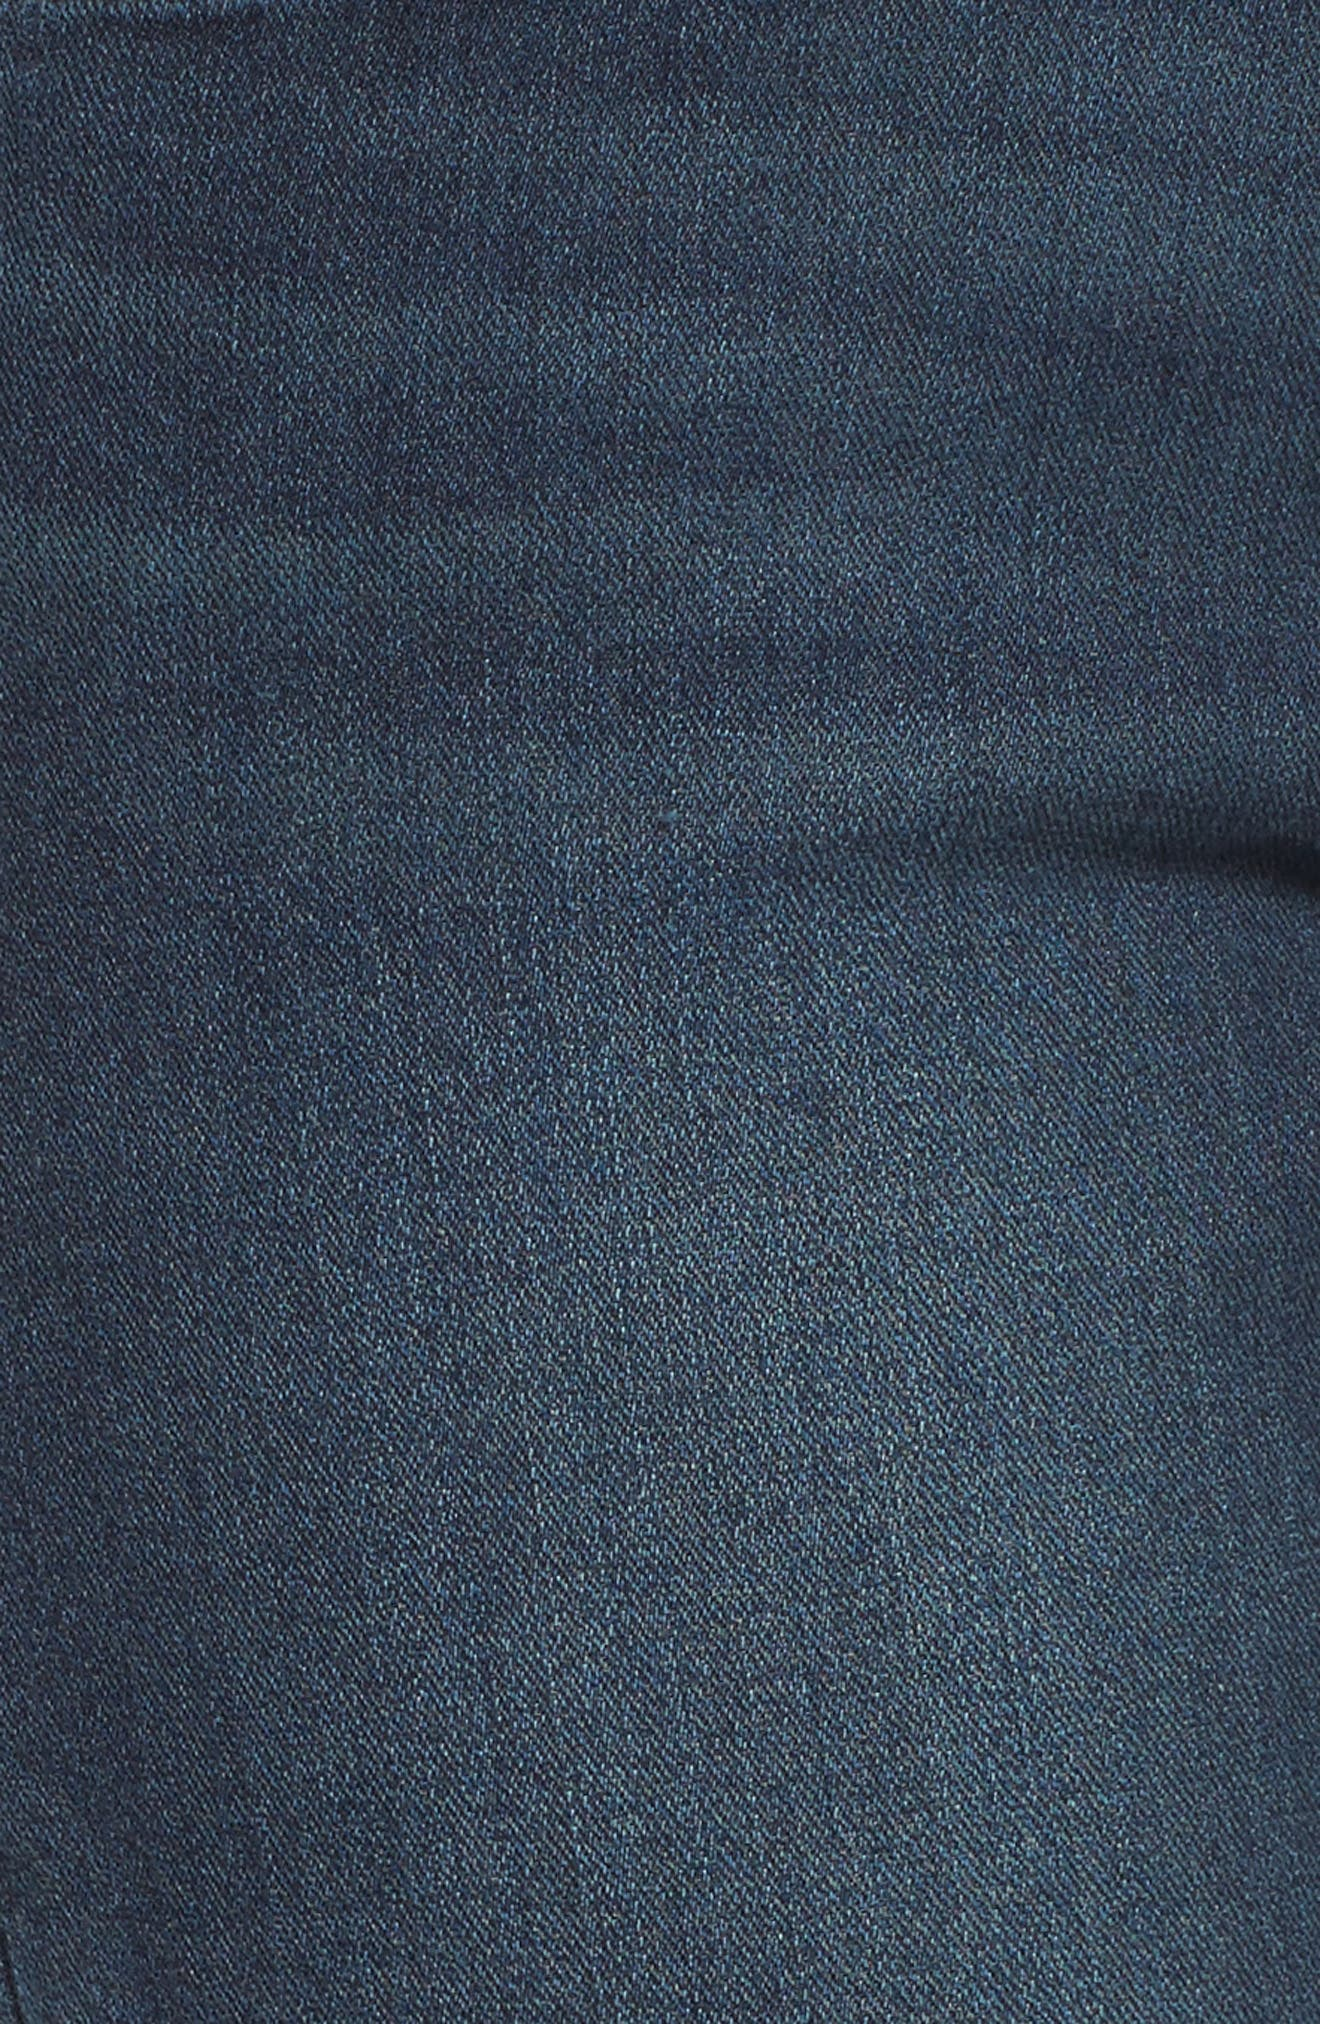 Skinny Jeans,                             Alternate thumbnail 6, color,                             420